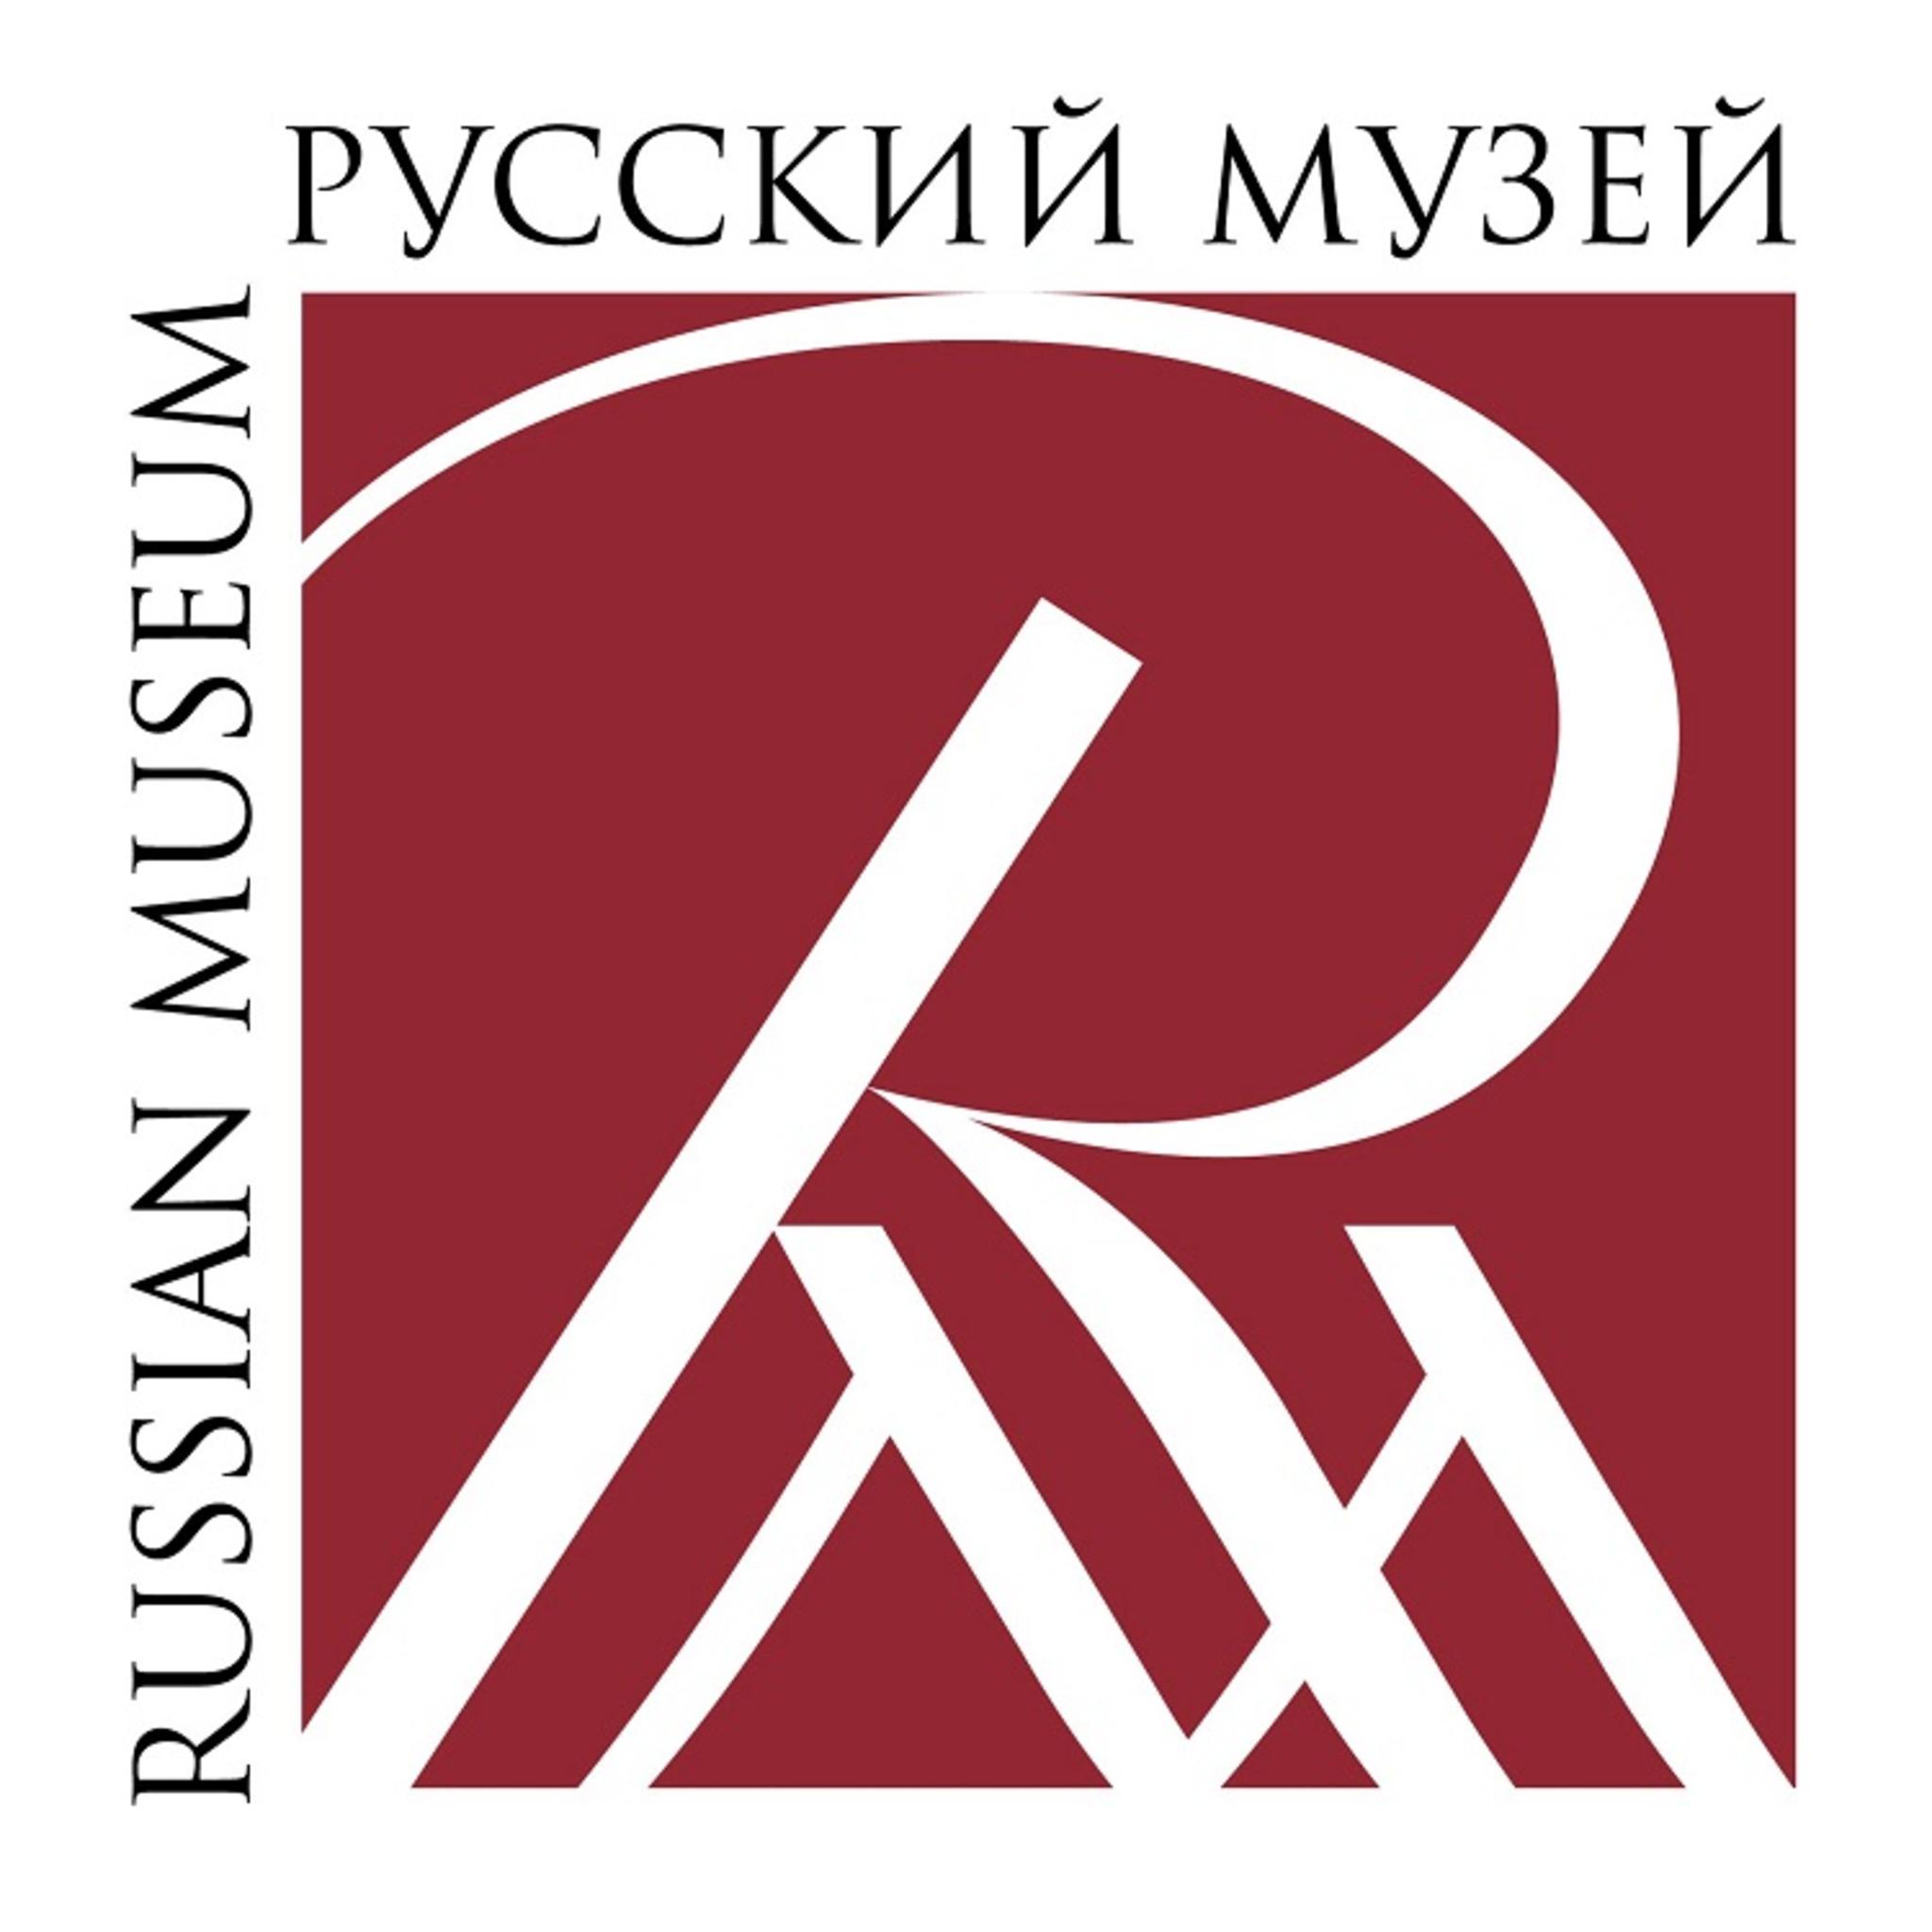 Фестиваль конкурс санкт петербург 2017